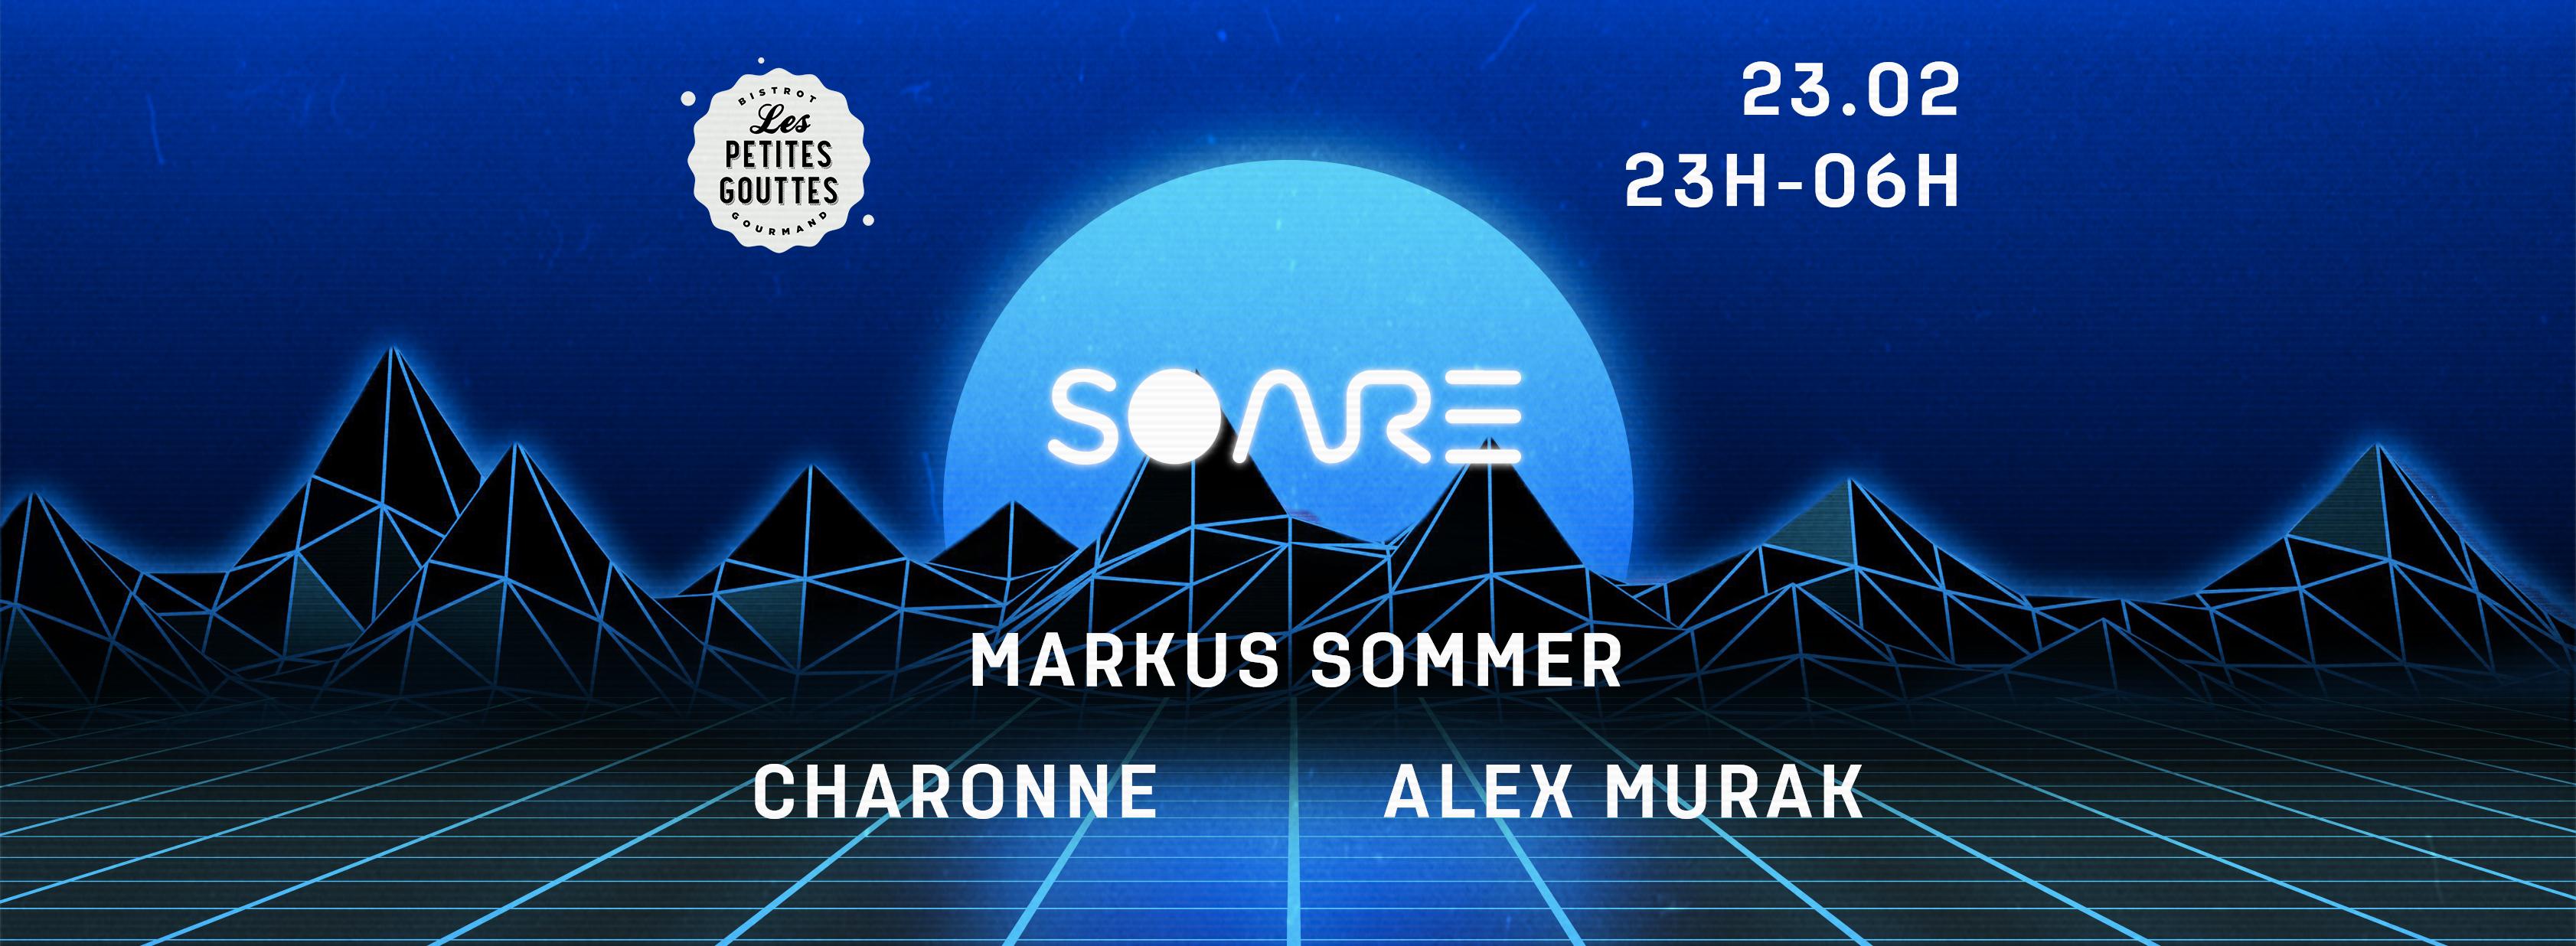 Soare invite : Markus Sommer, Charonne, Alex Murak